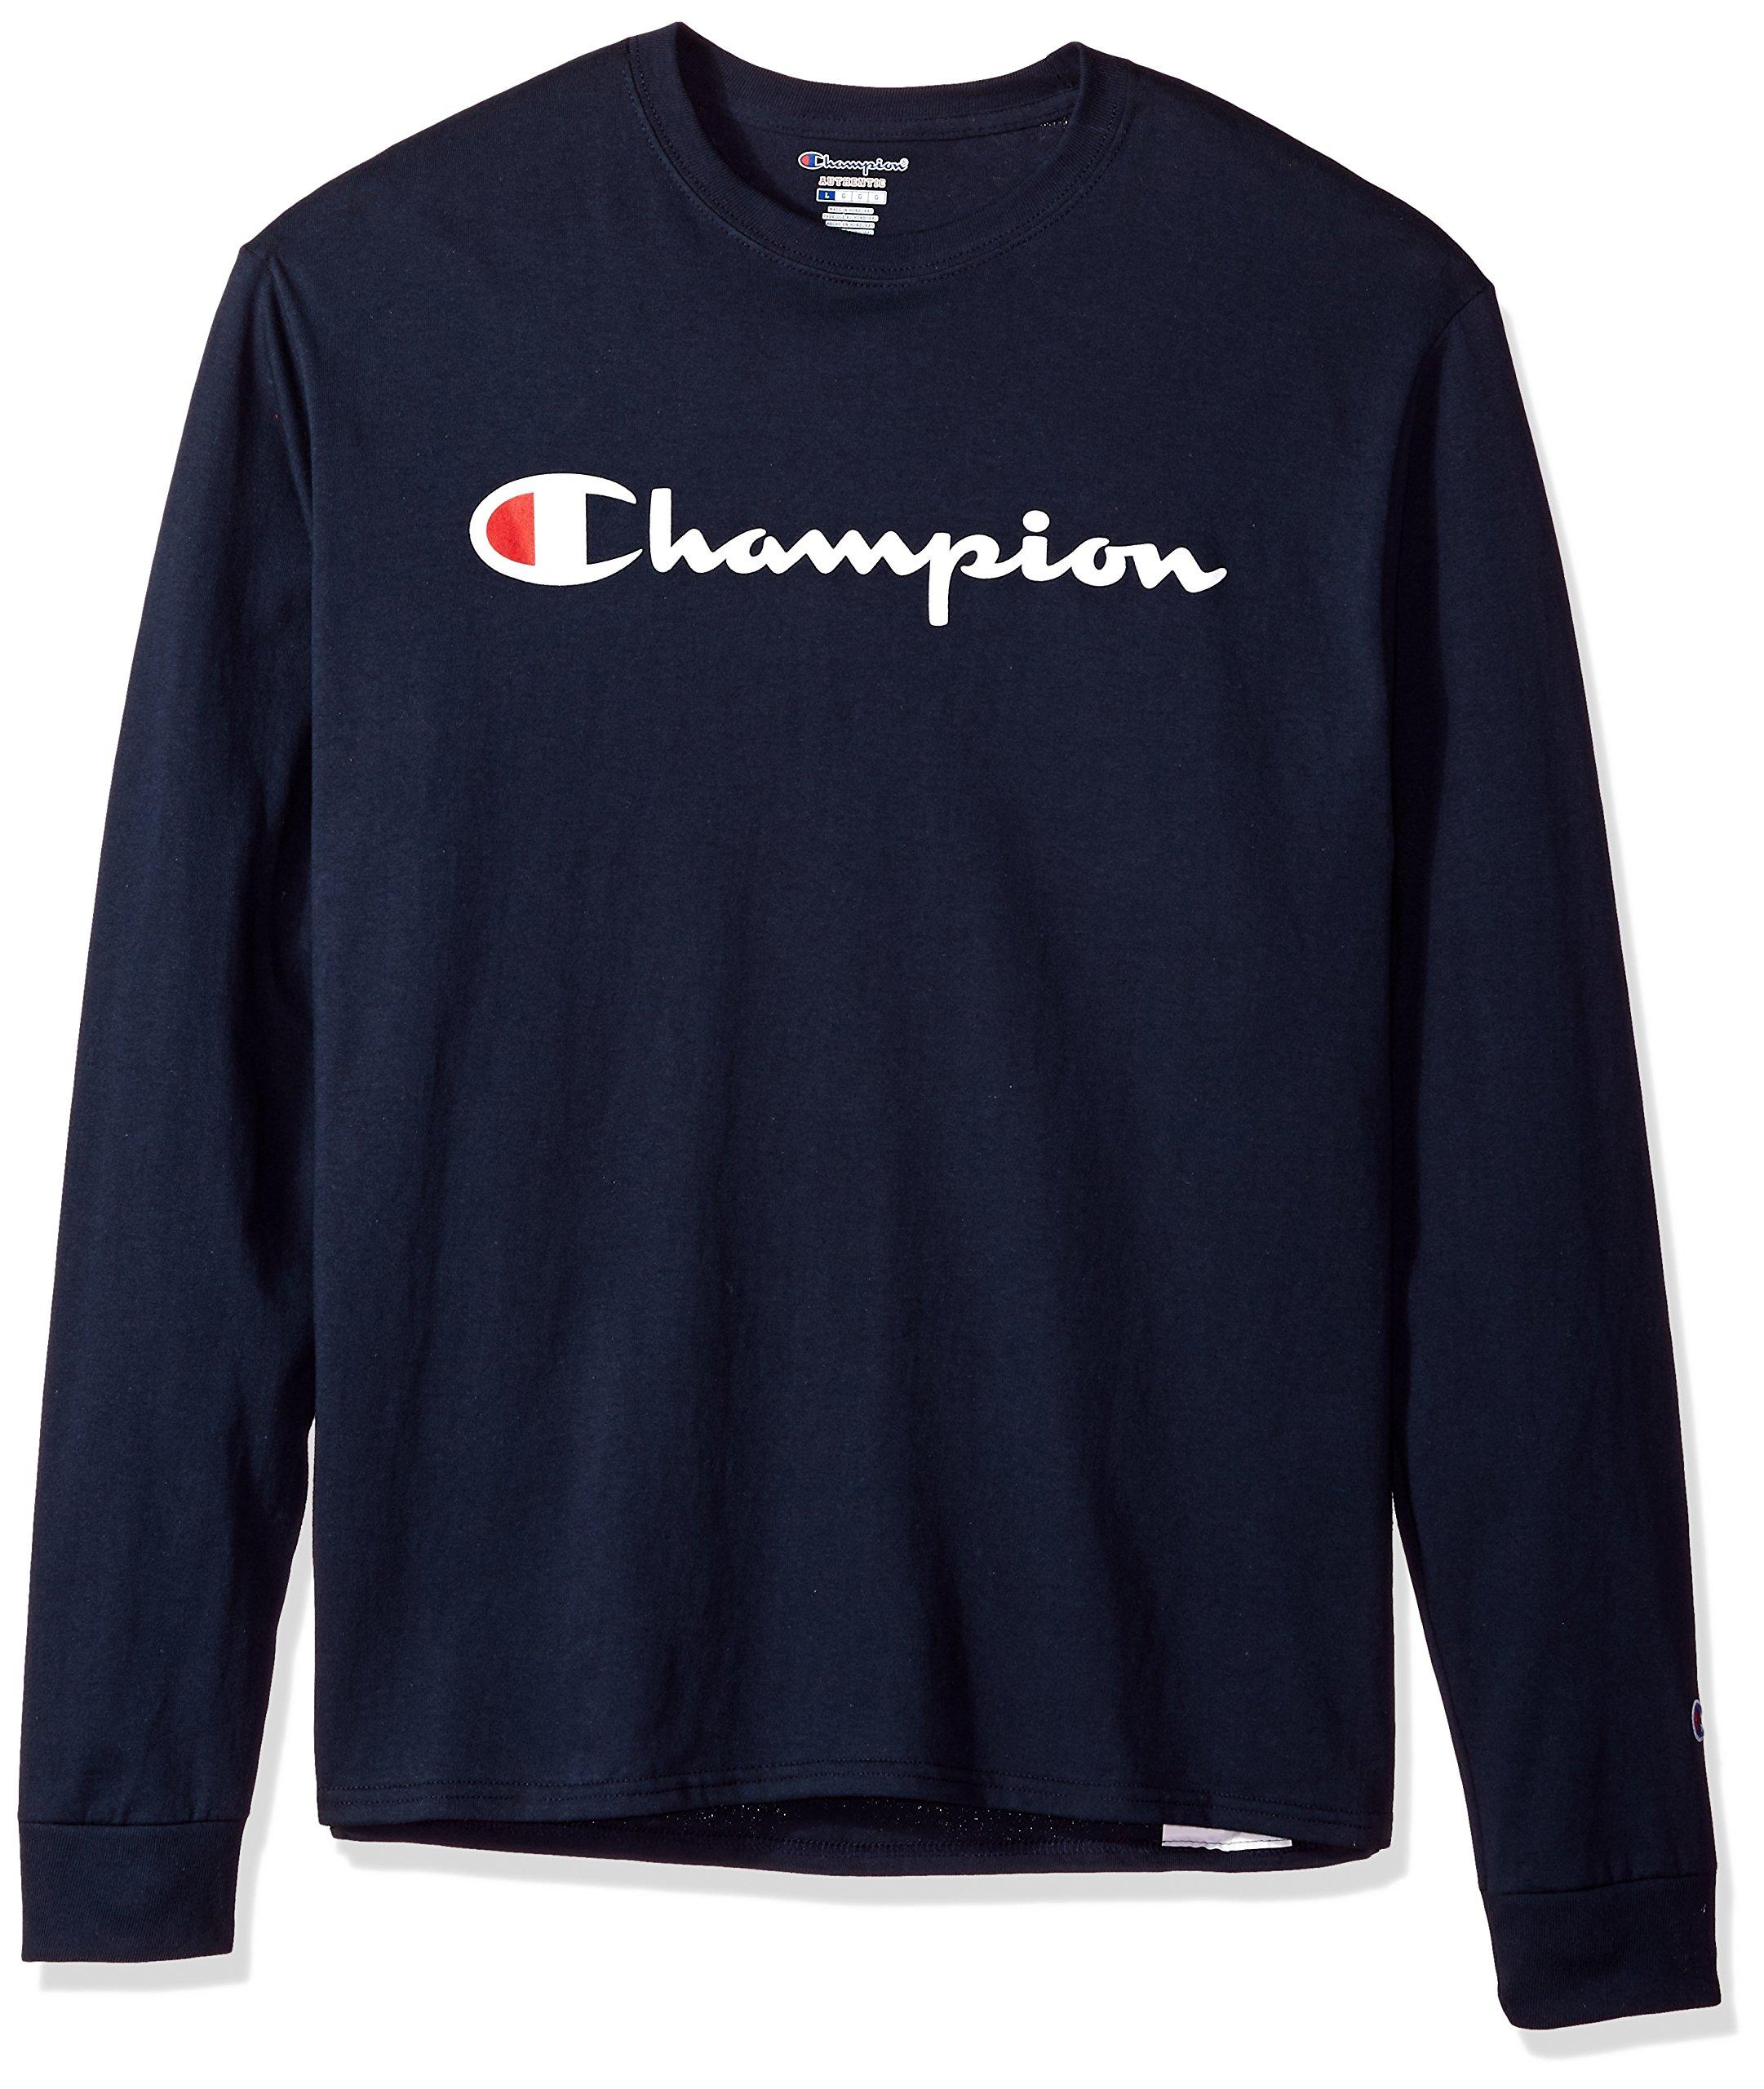 Champion LIFE Men's Cotton Tee (Patriotic Long Sleeve Script), Navy/Patriotic Champion Script, L